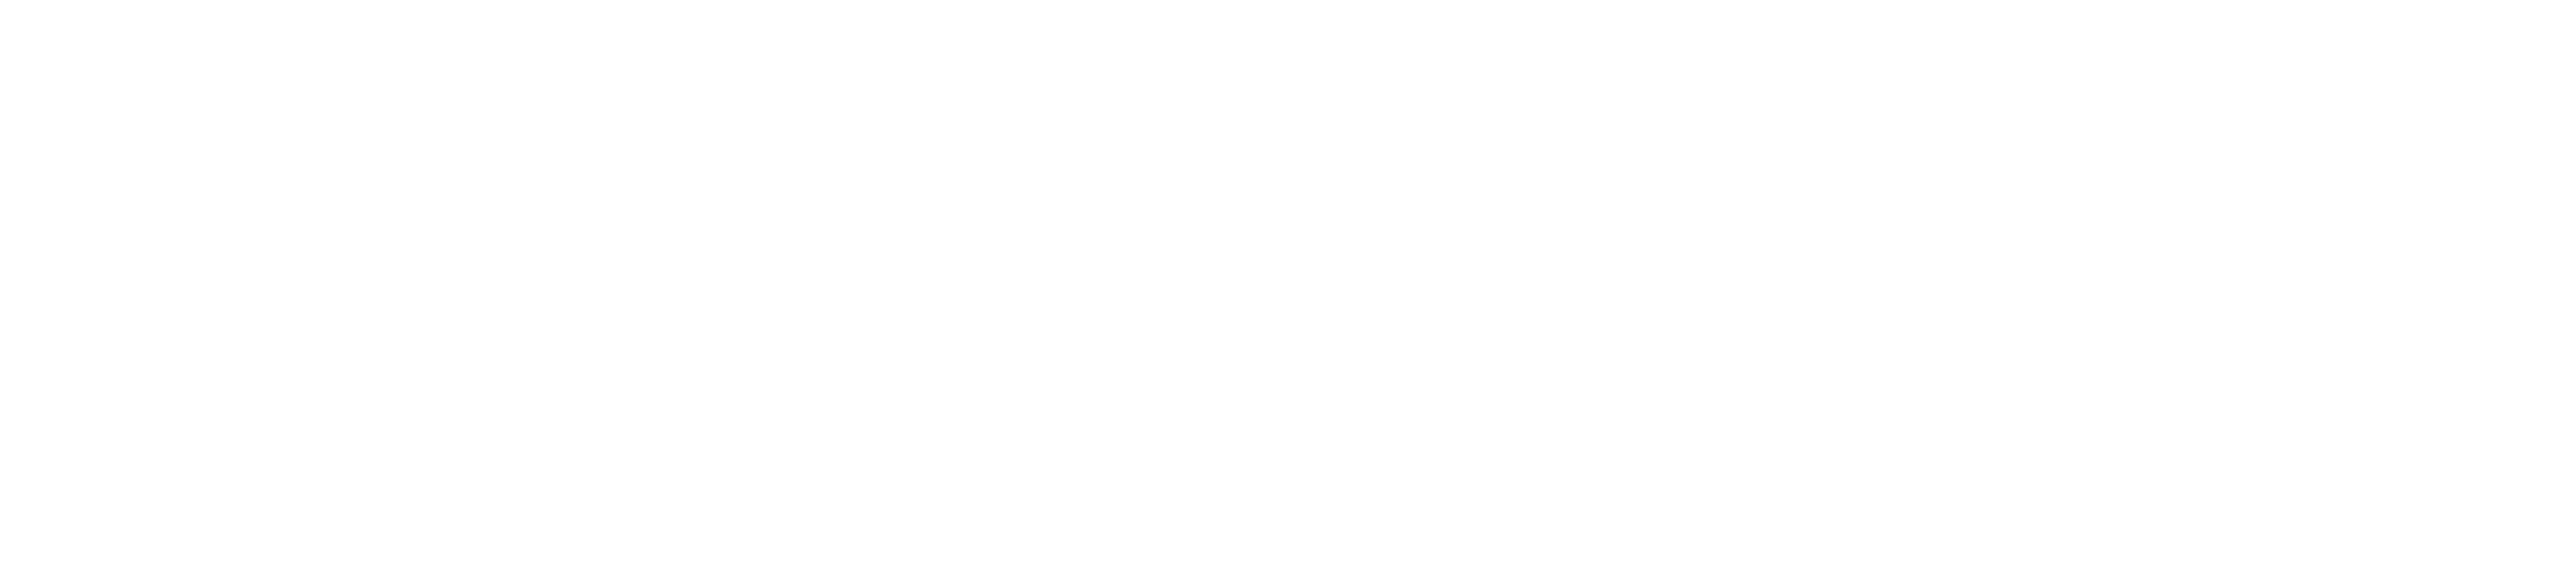 PDY&F | Greensboro, NC